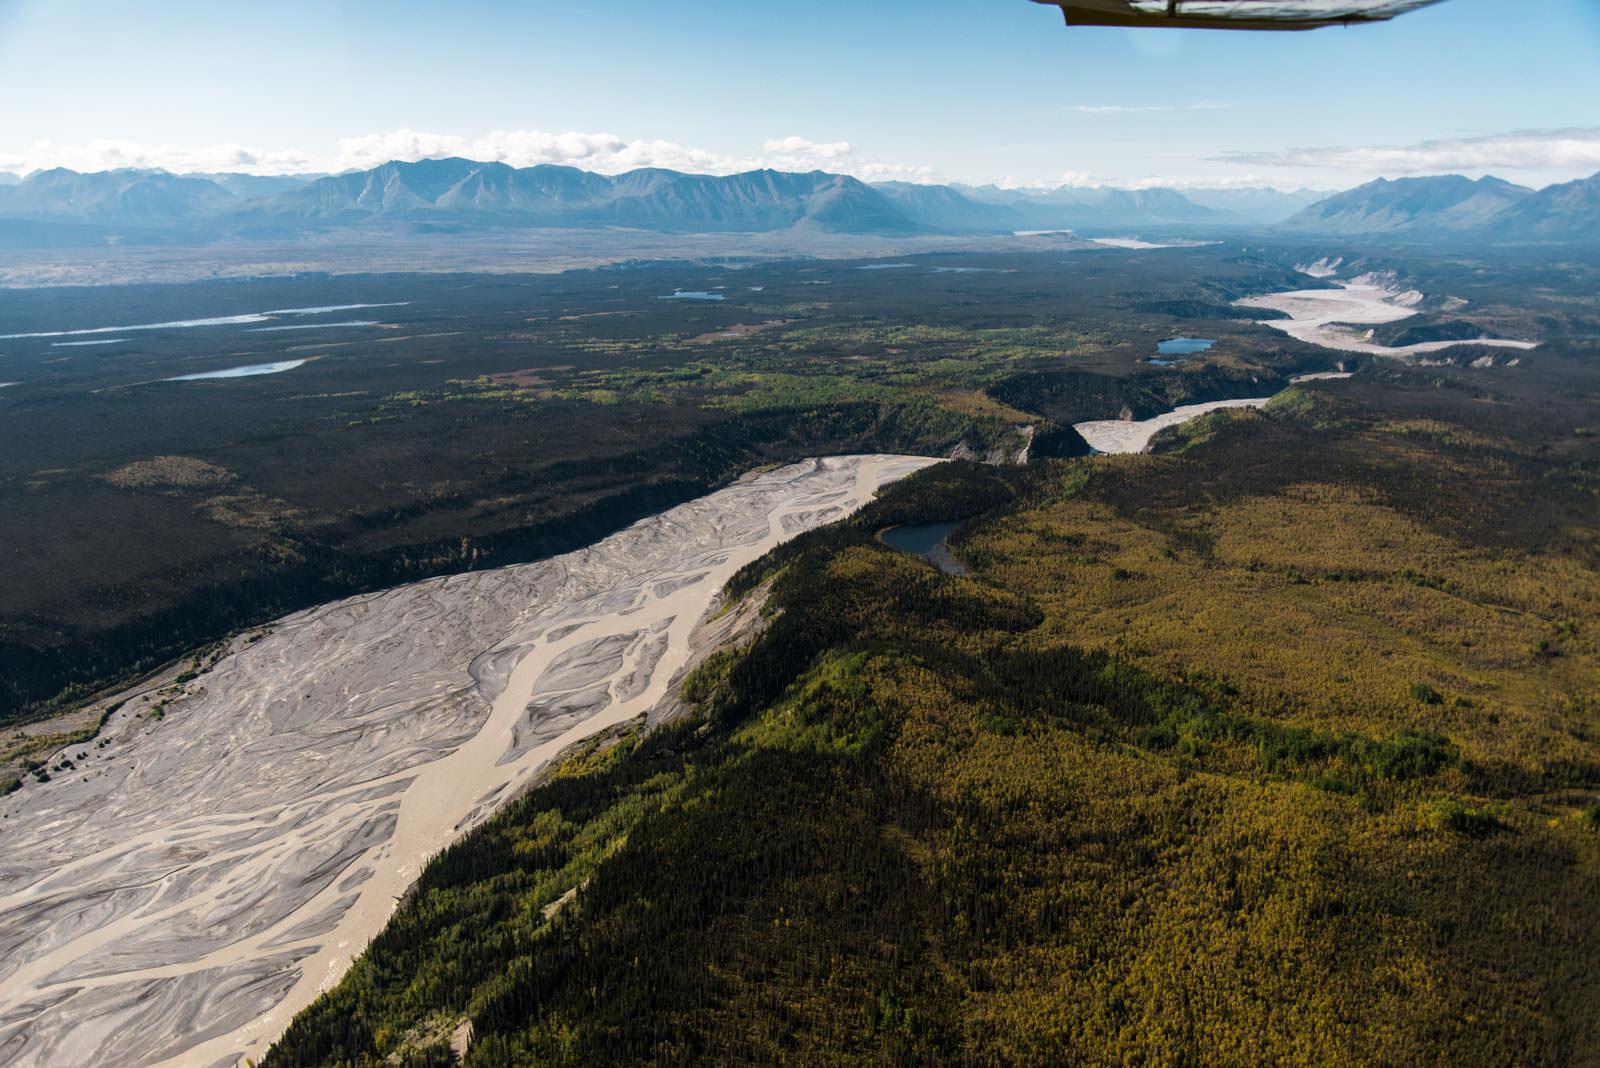 Bagley Icefield - University Range Tour:  Braided River